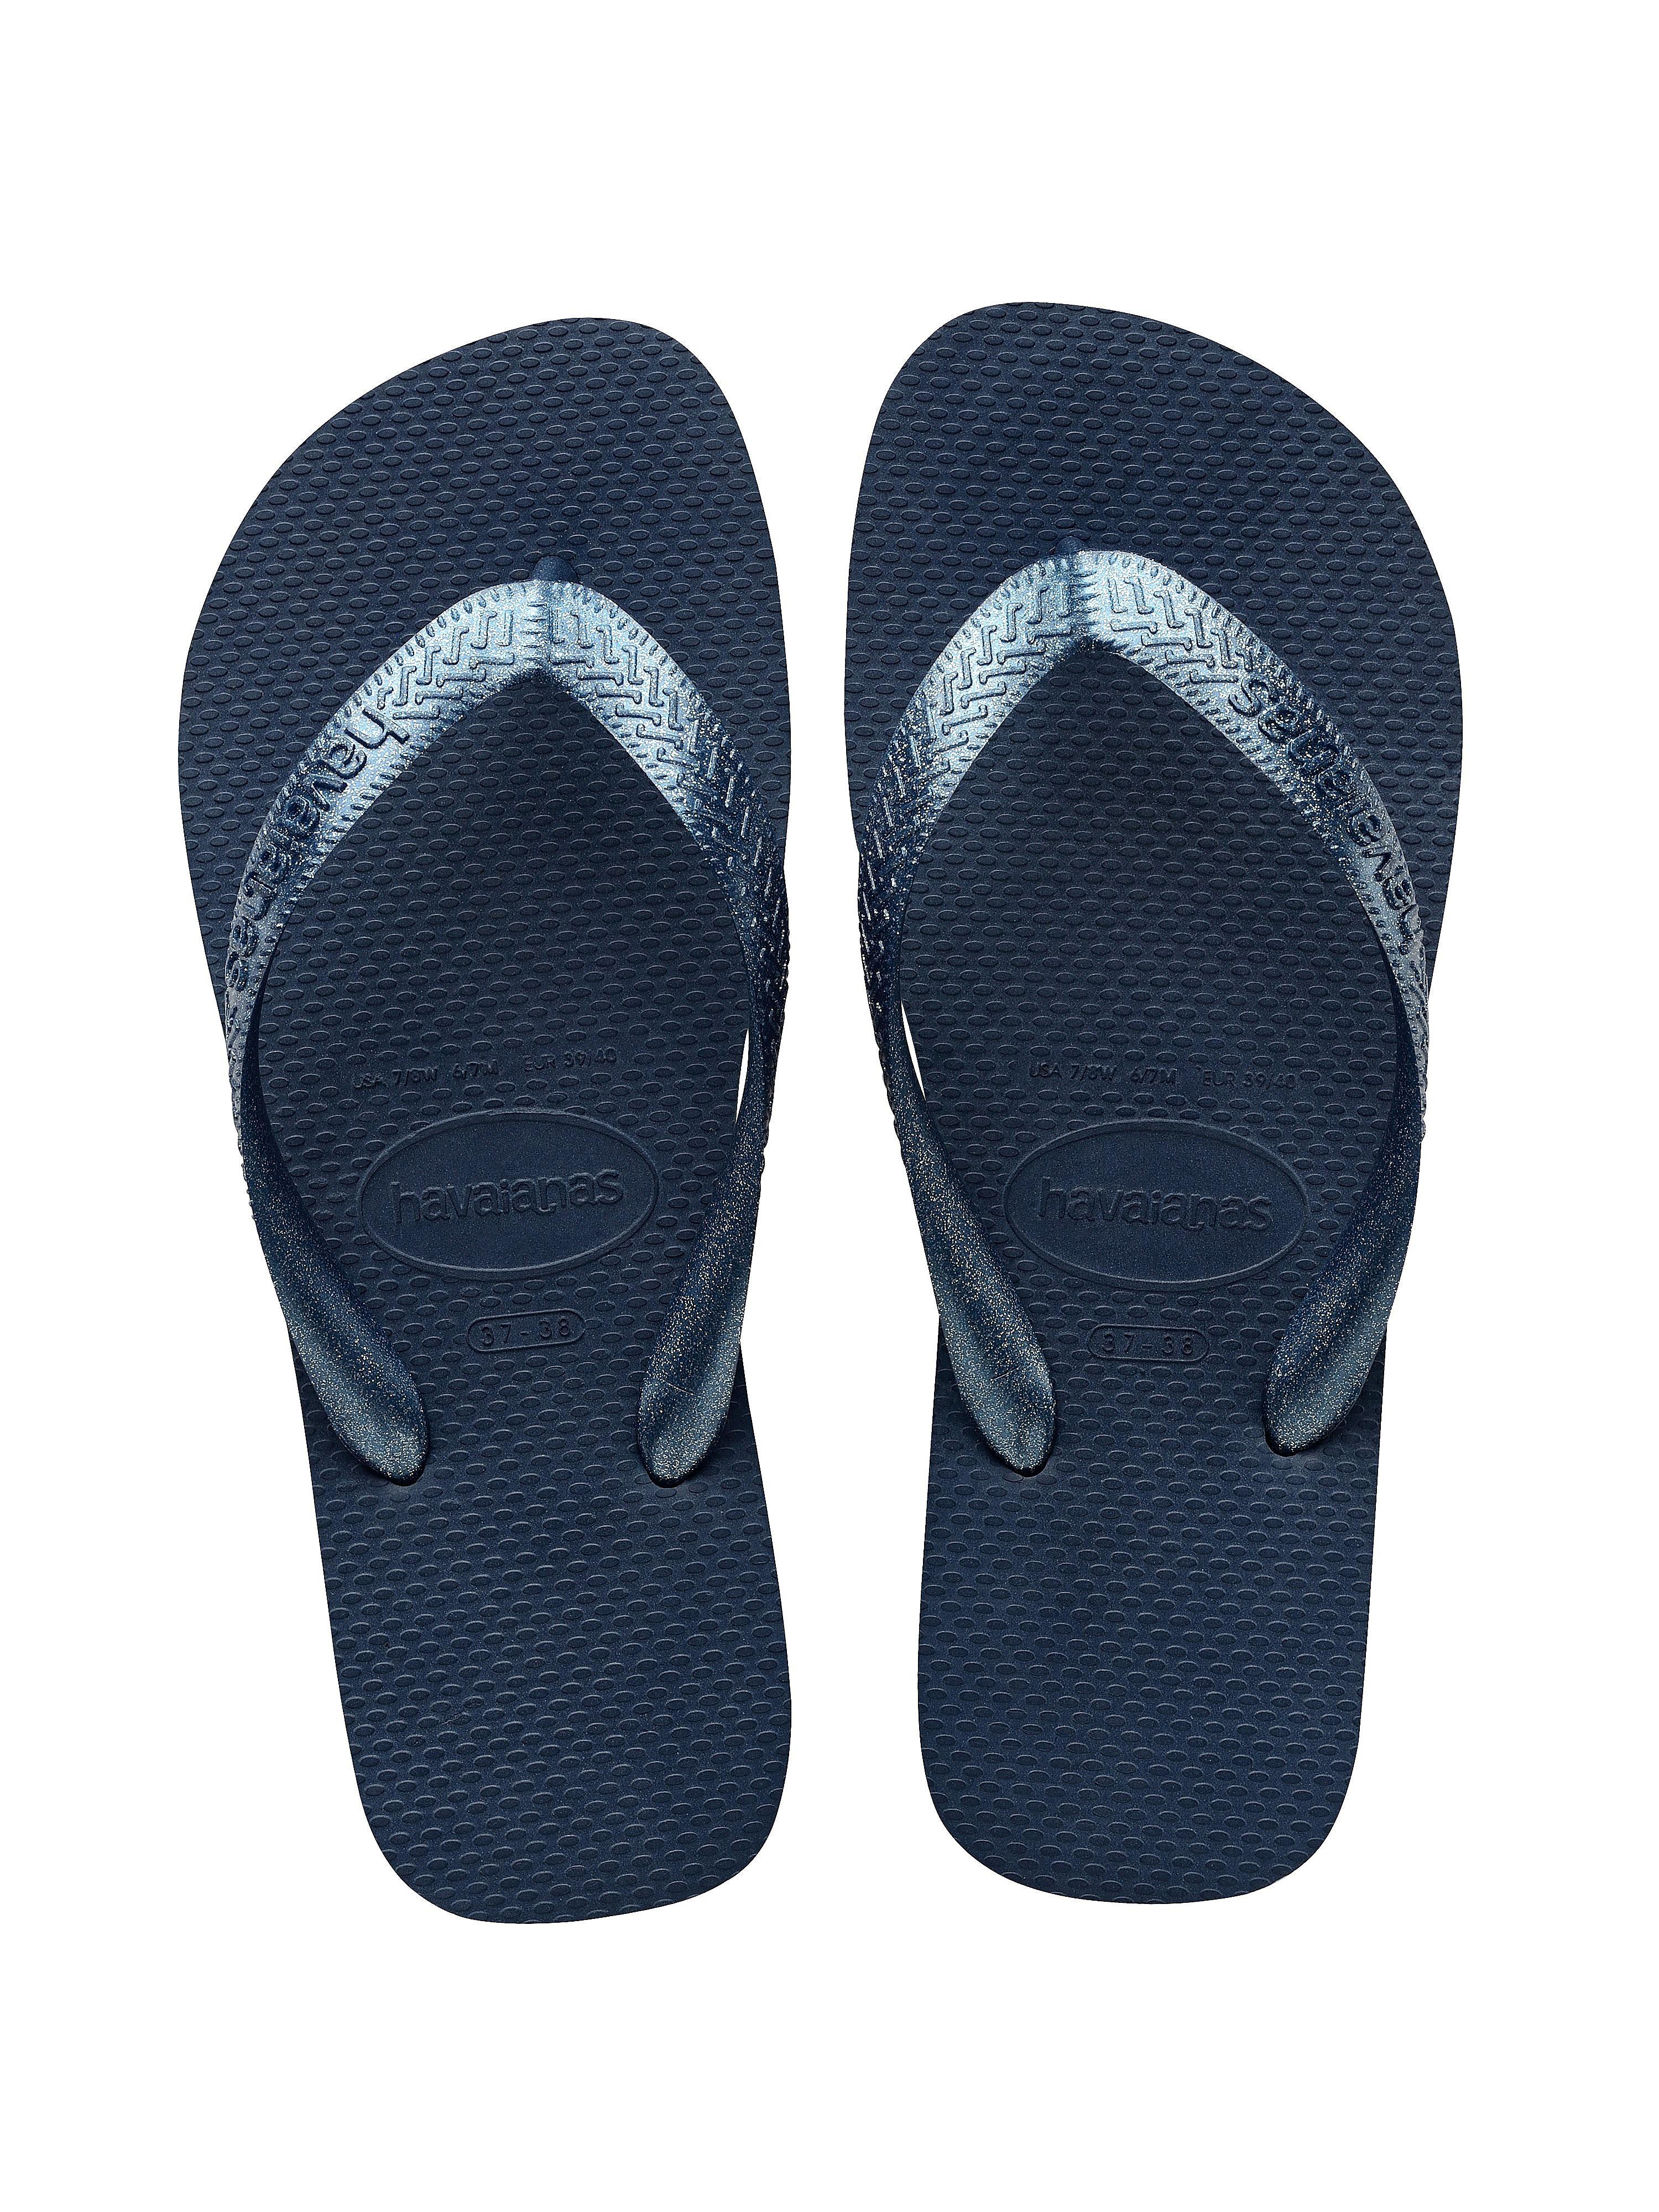 Havaianas Women's Top Tira Flip Flops - Indigo Blue